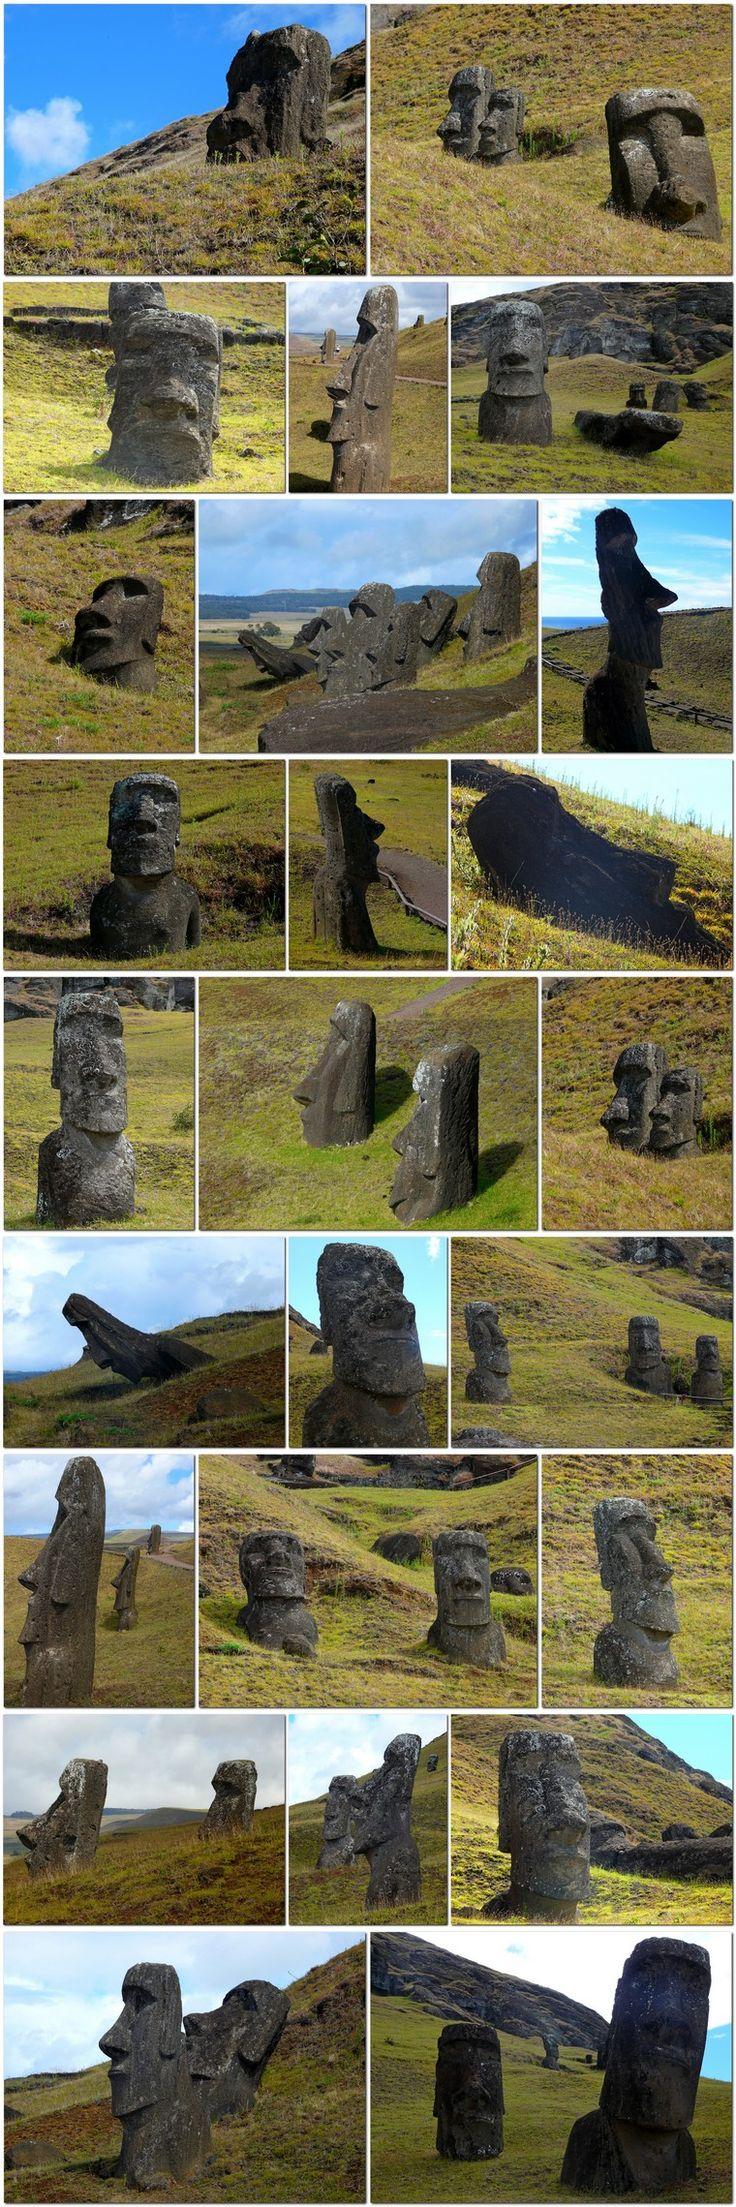 Moais on Rapa Nui.